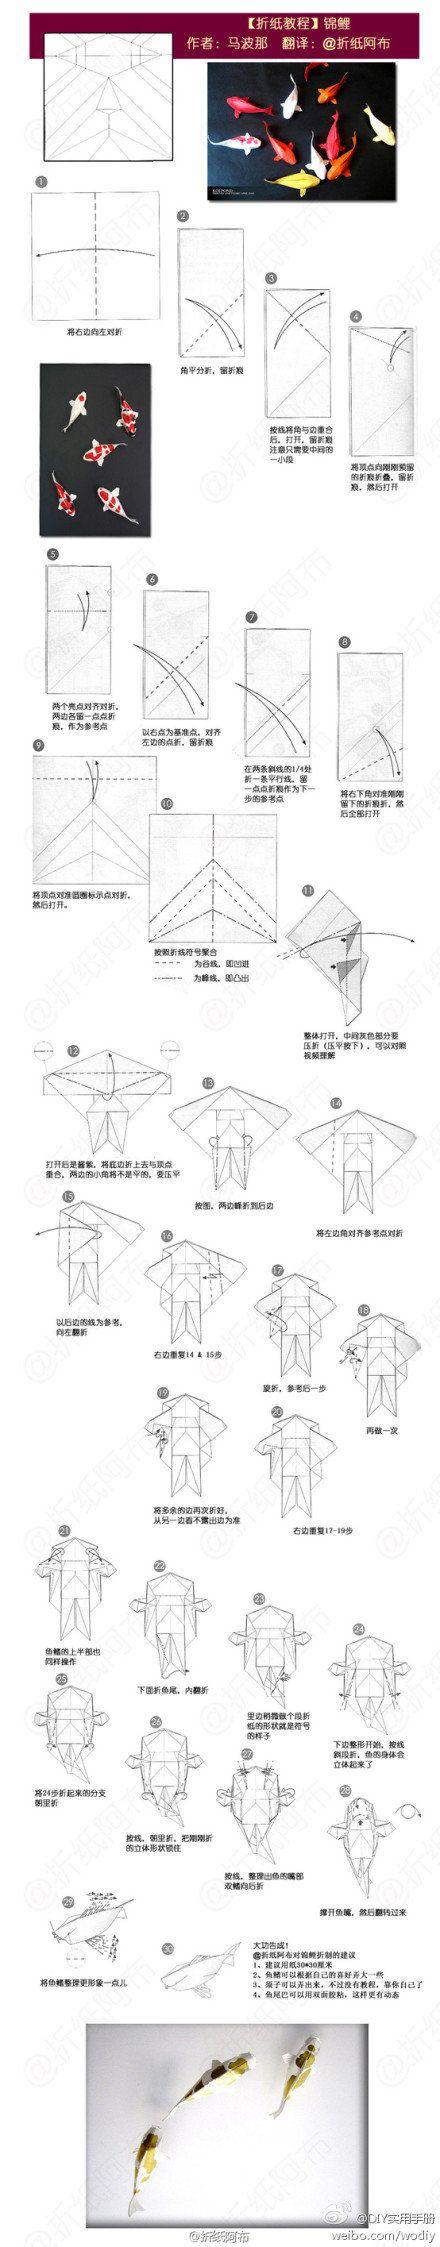 origami beautiful koi fish folding instructions origami instruction [ 440 x 2247 Pixel ]